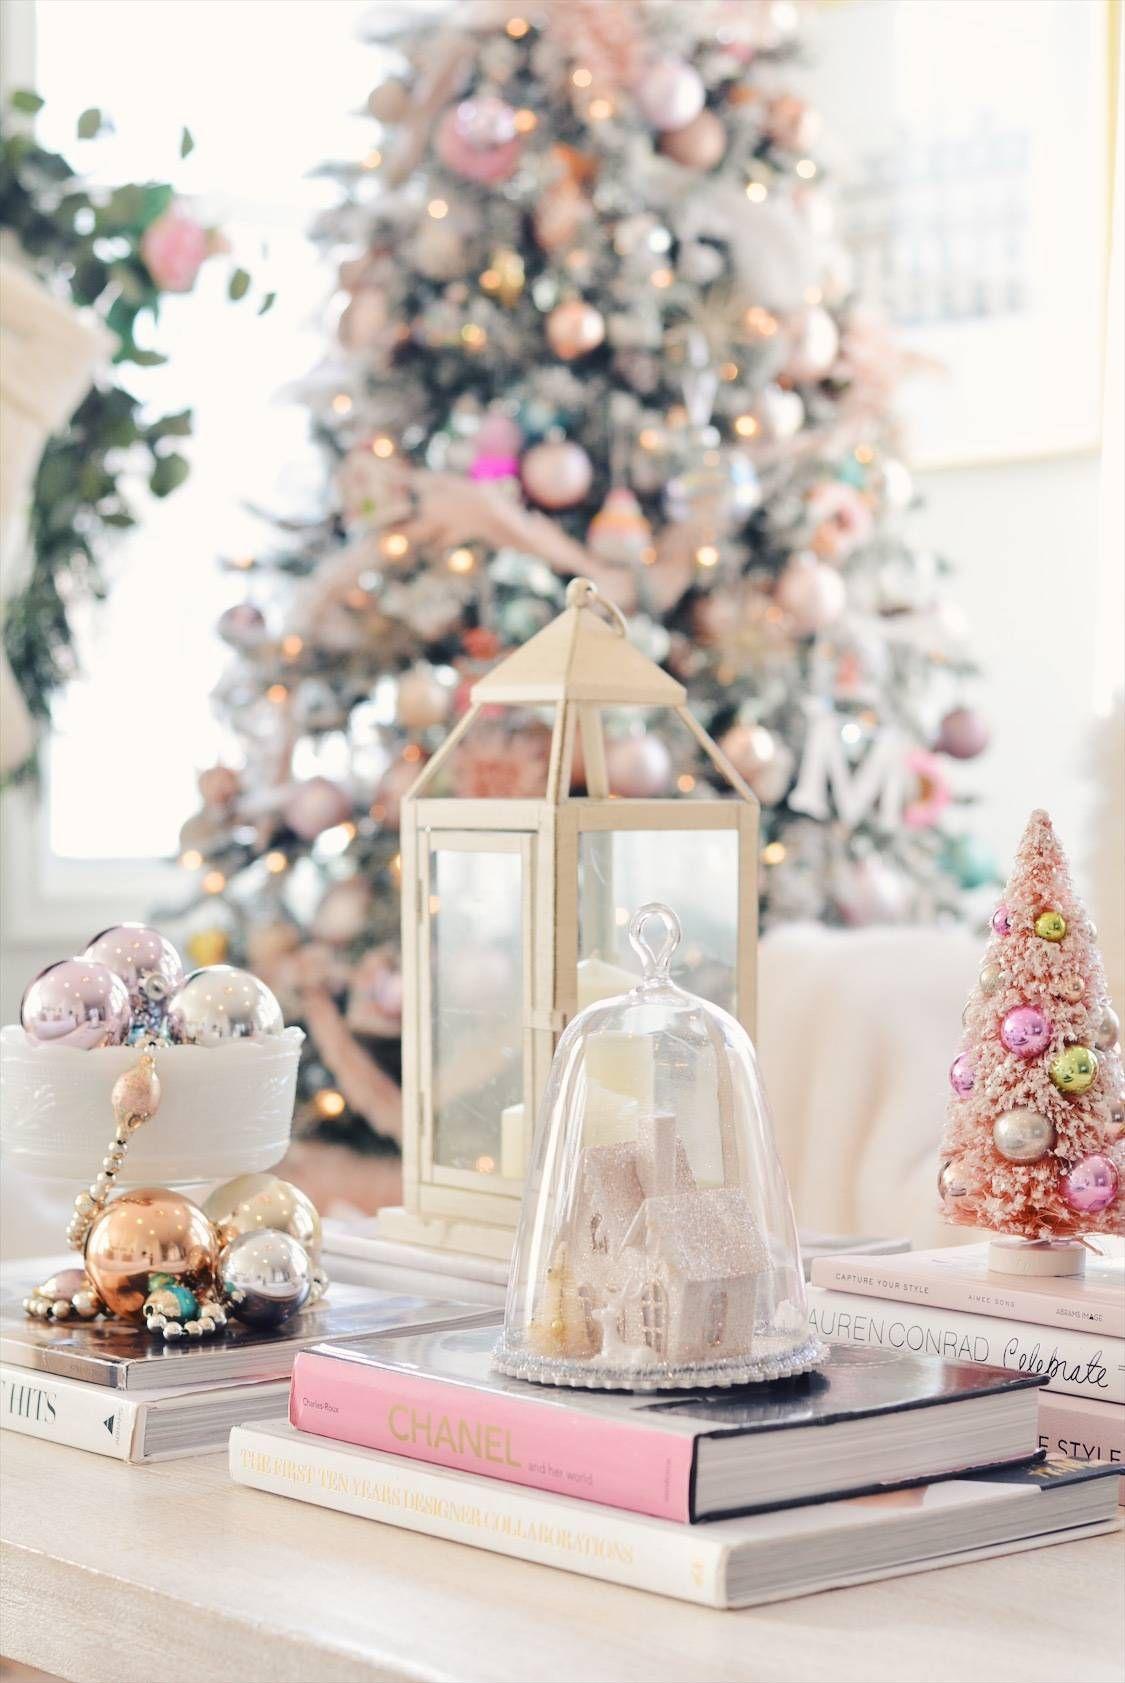 Elegant Christmas Pink Christmas Tree Decor The Pink Dream Pink Christmas Pink Christmas Decorations Pink Christmas Tree Decorations